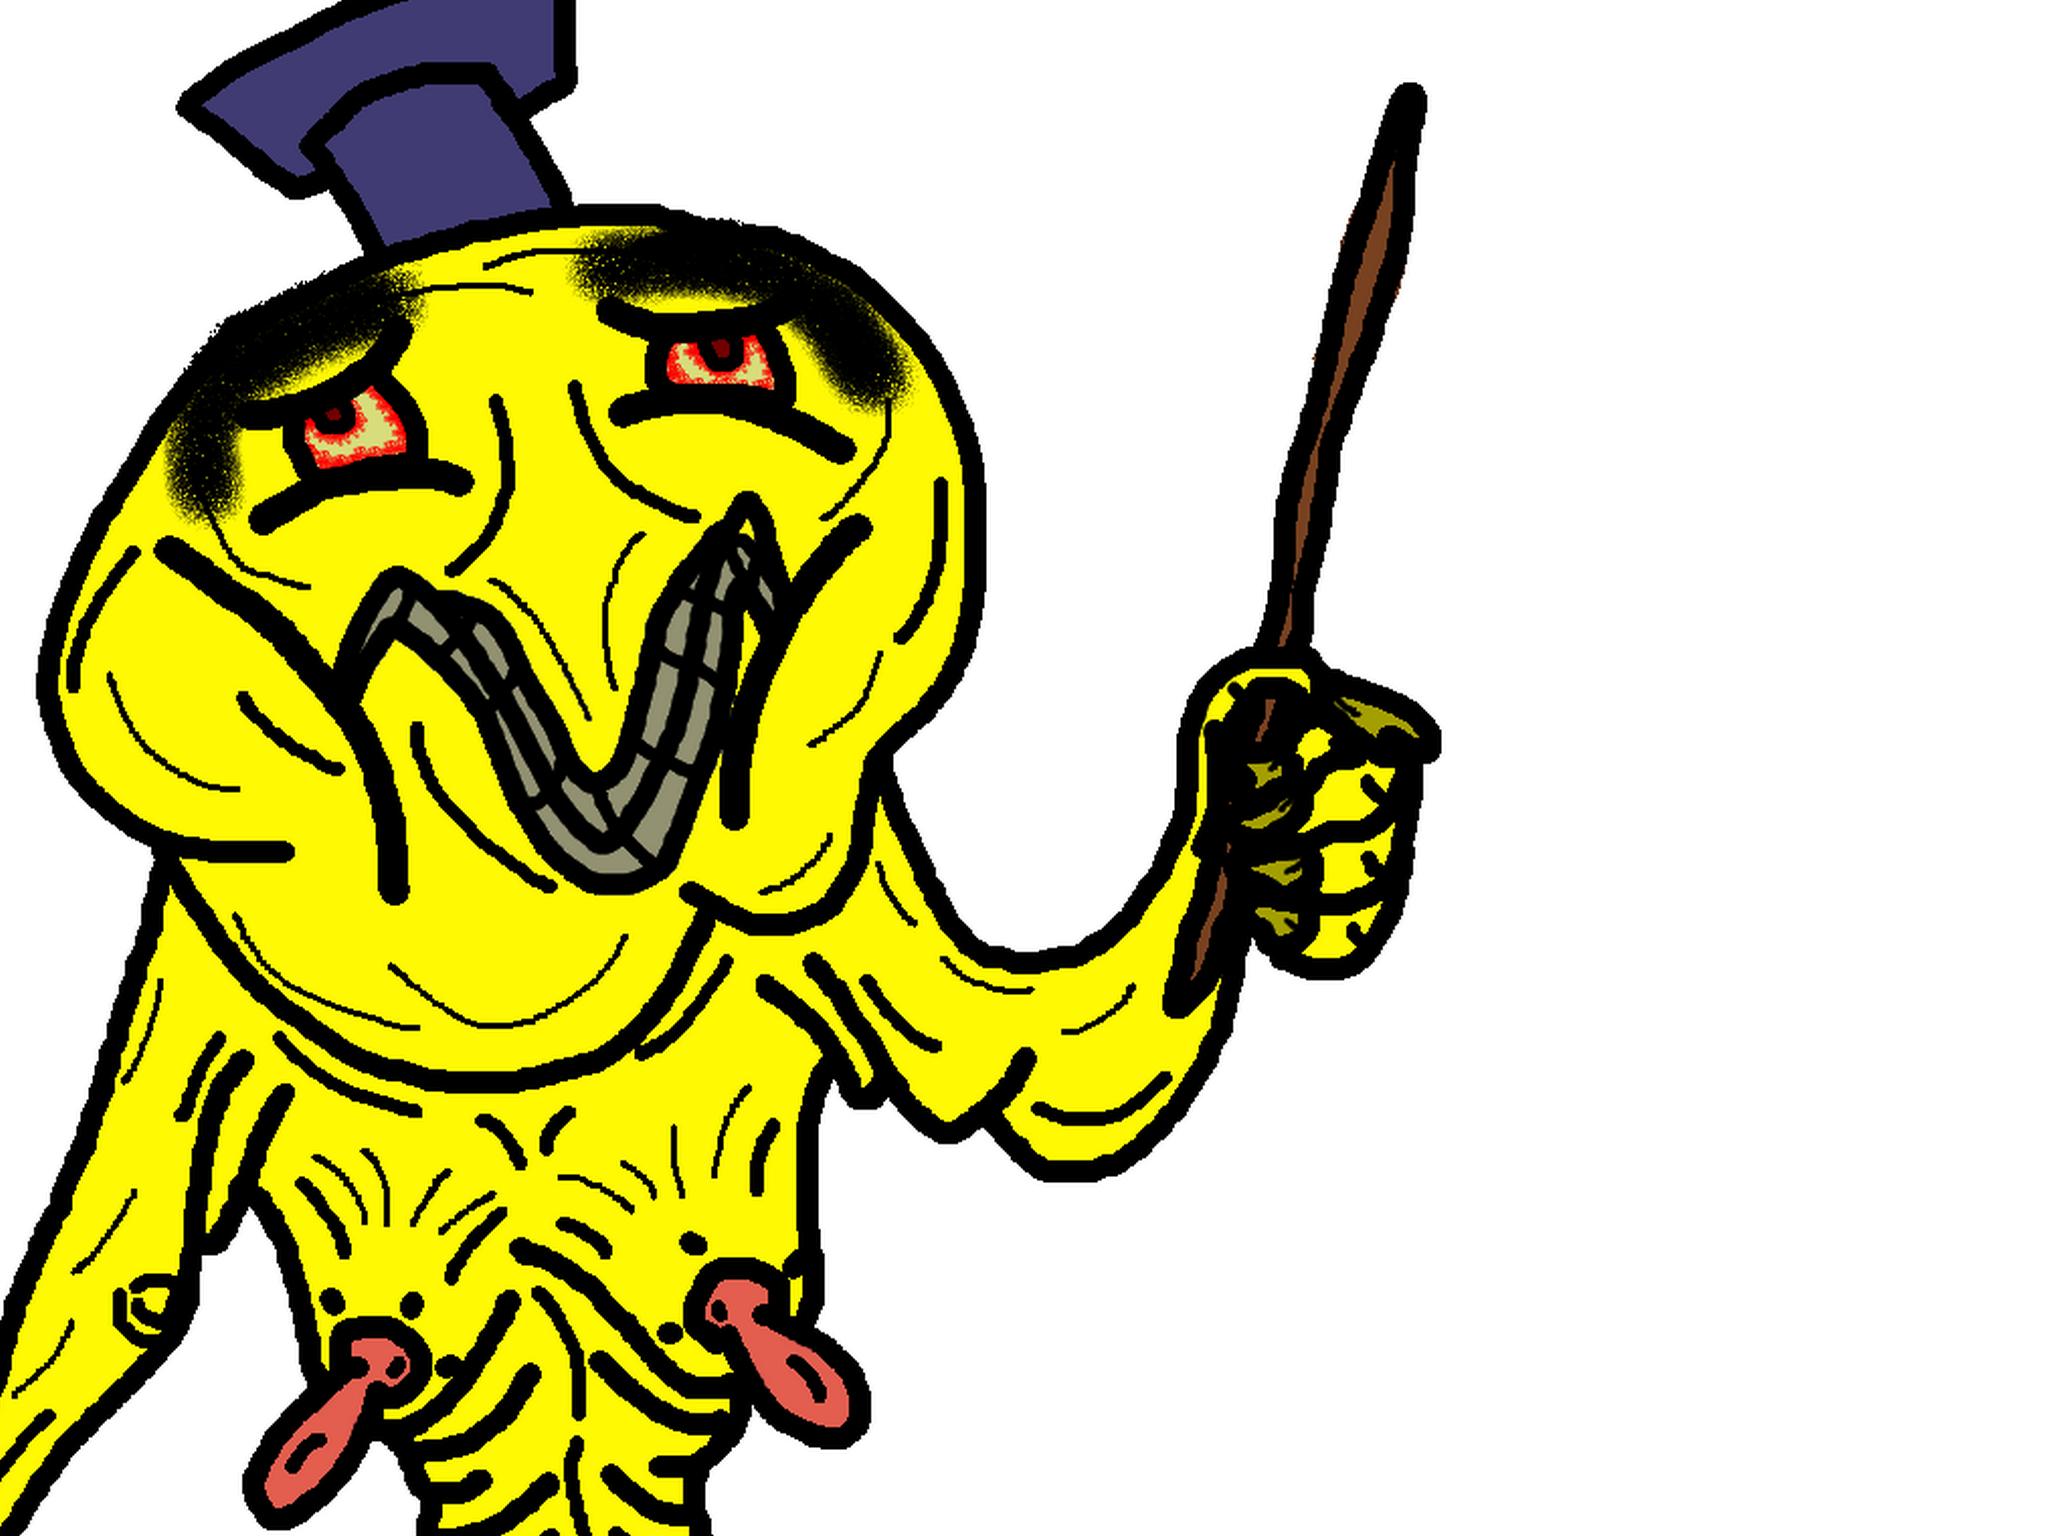 Sticker diplome hap omg baguette bizarre creepy